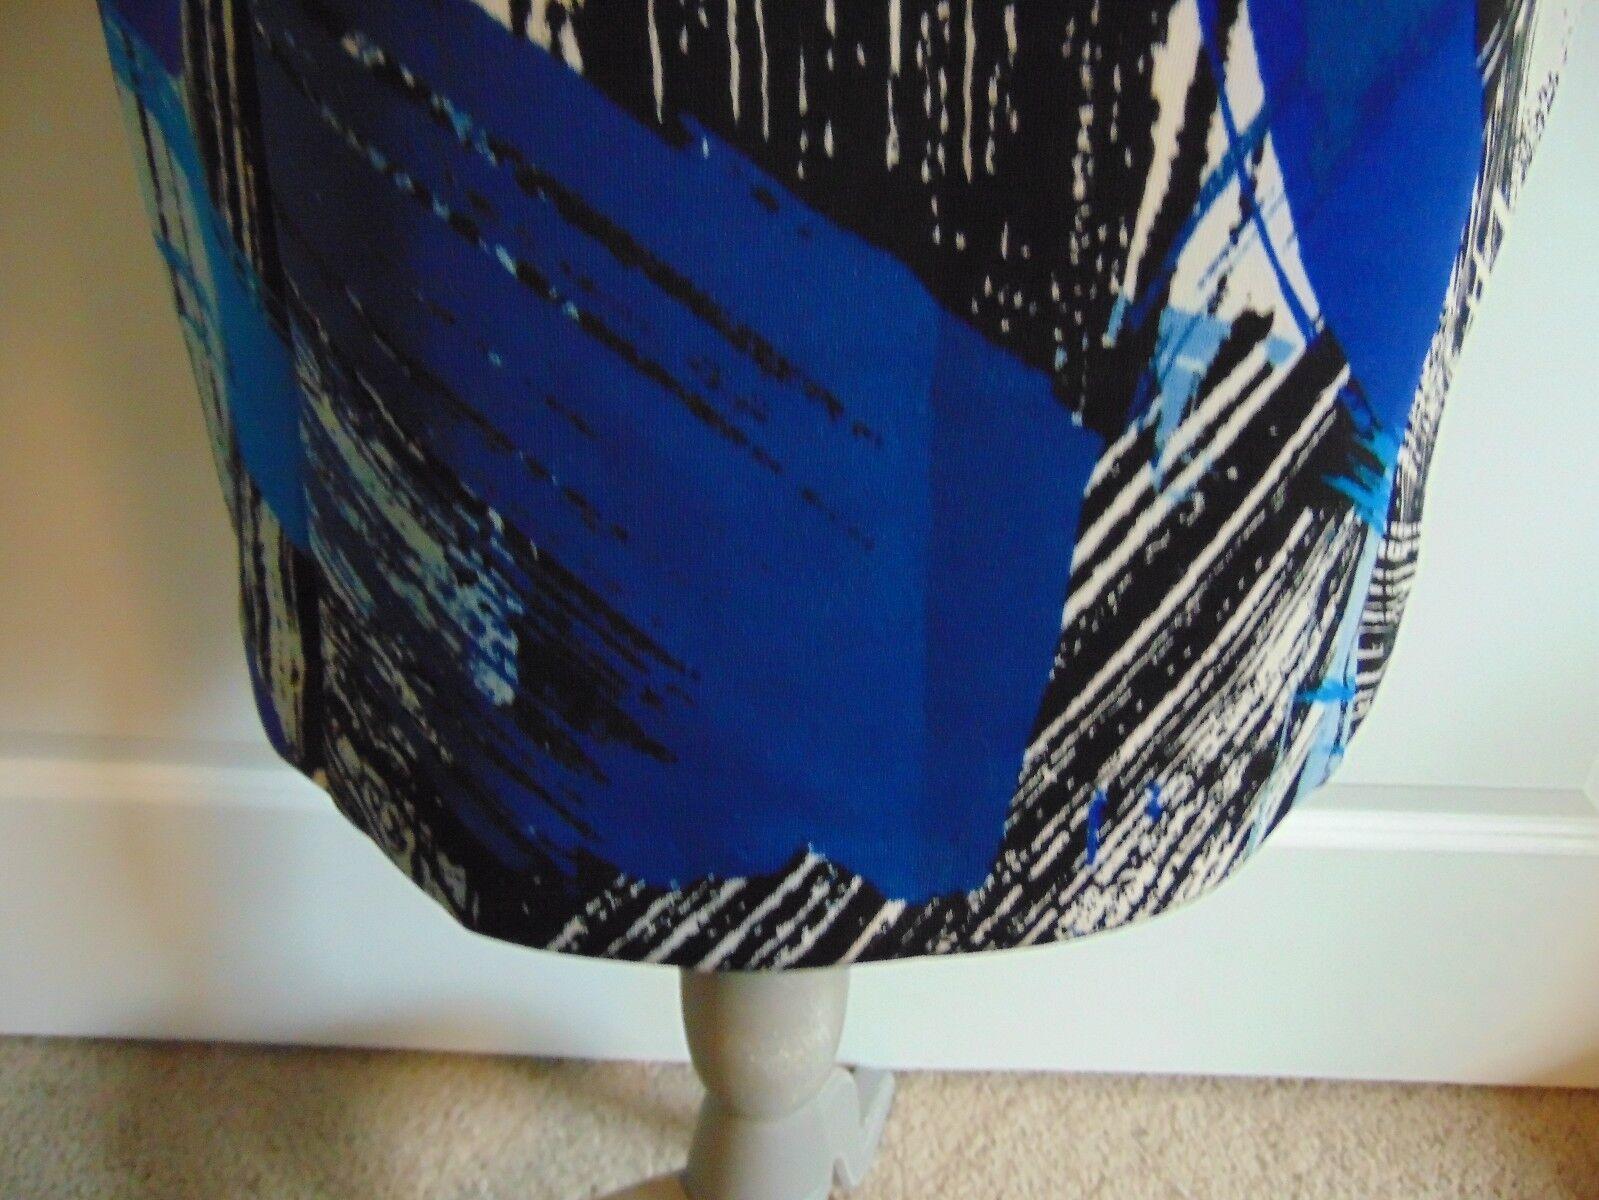 NWT Vince Camuto Sleeveless Sheath Art Inspired Inspired Inspired Bright bluee Dress size 8 d7f786